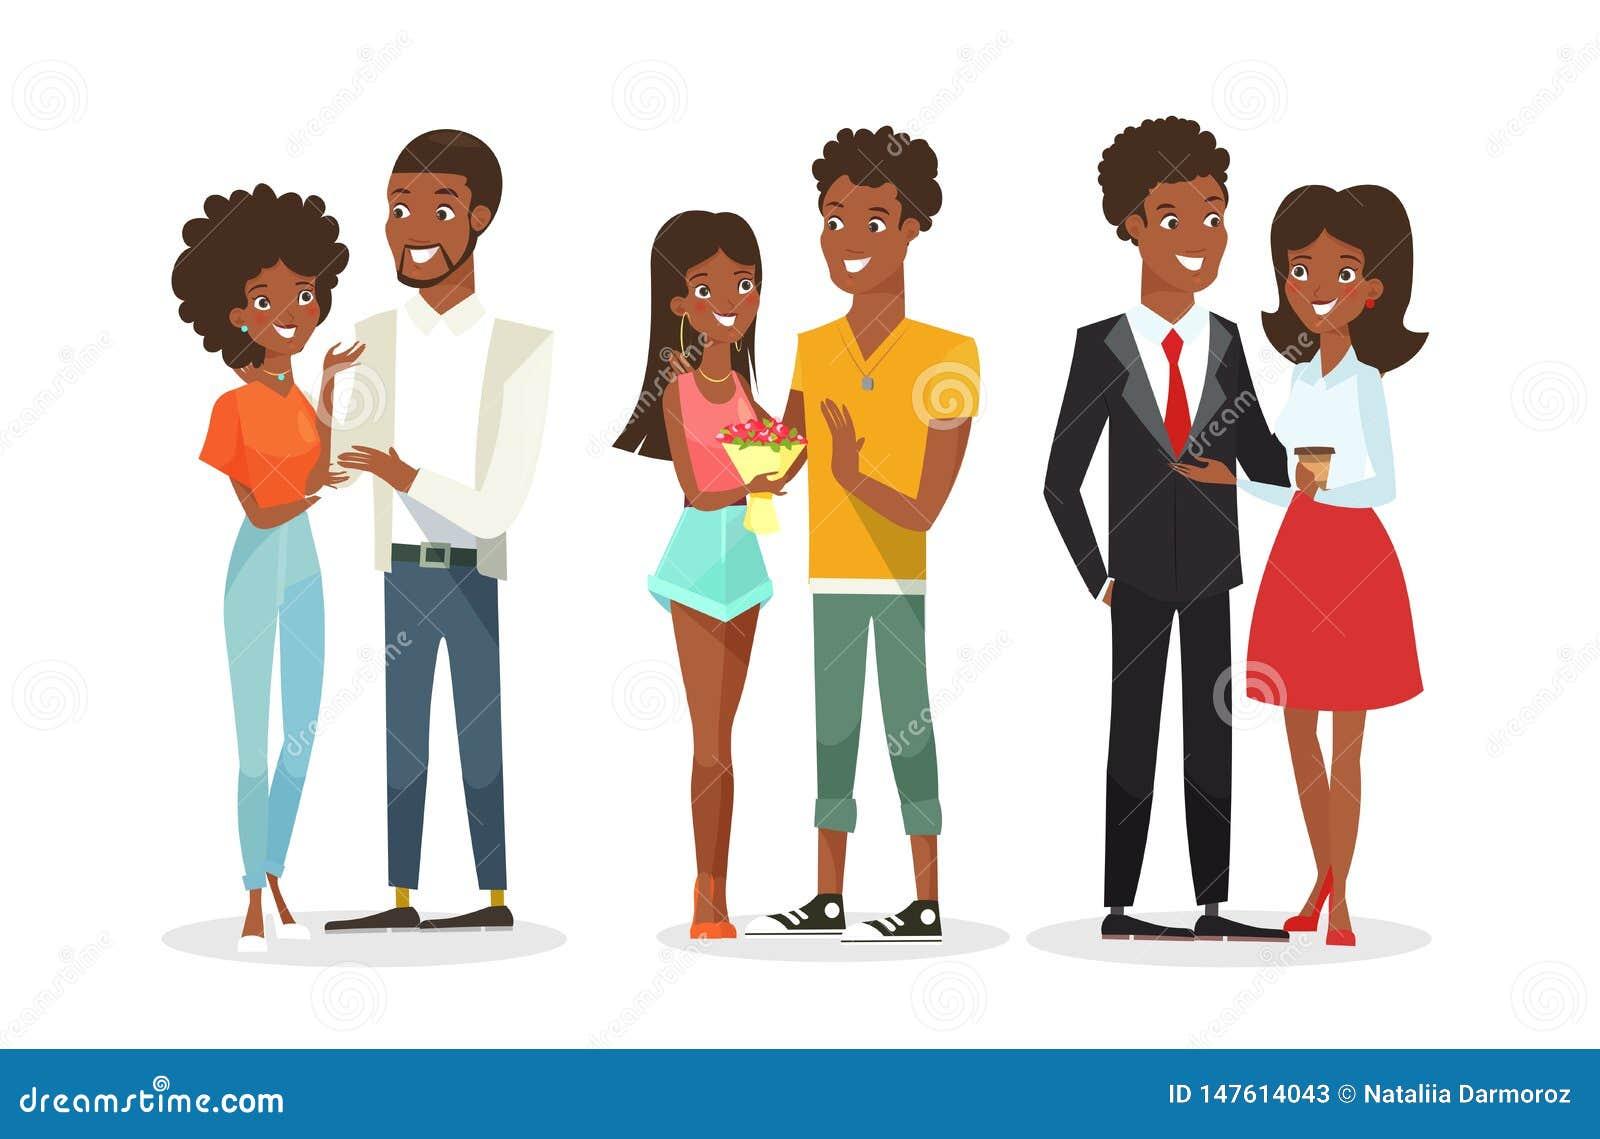 Vektorillustrationssatz Nette Afroamerikanerpaare Auf Dem